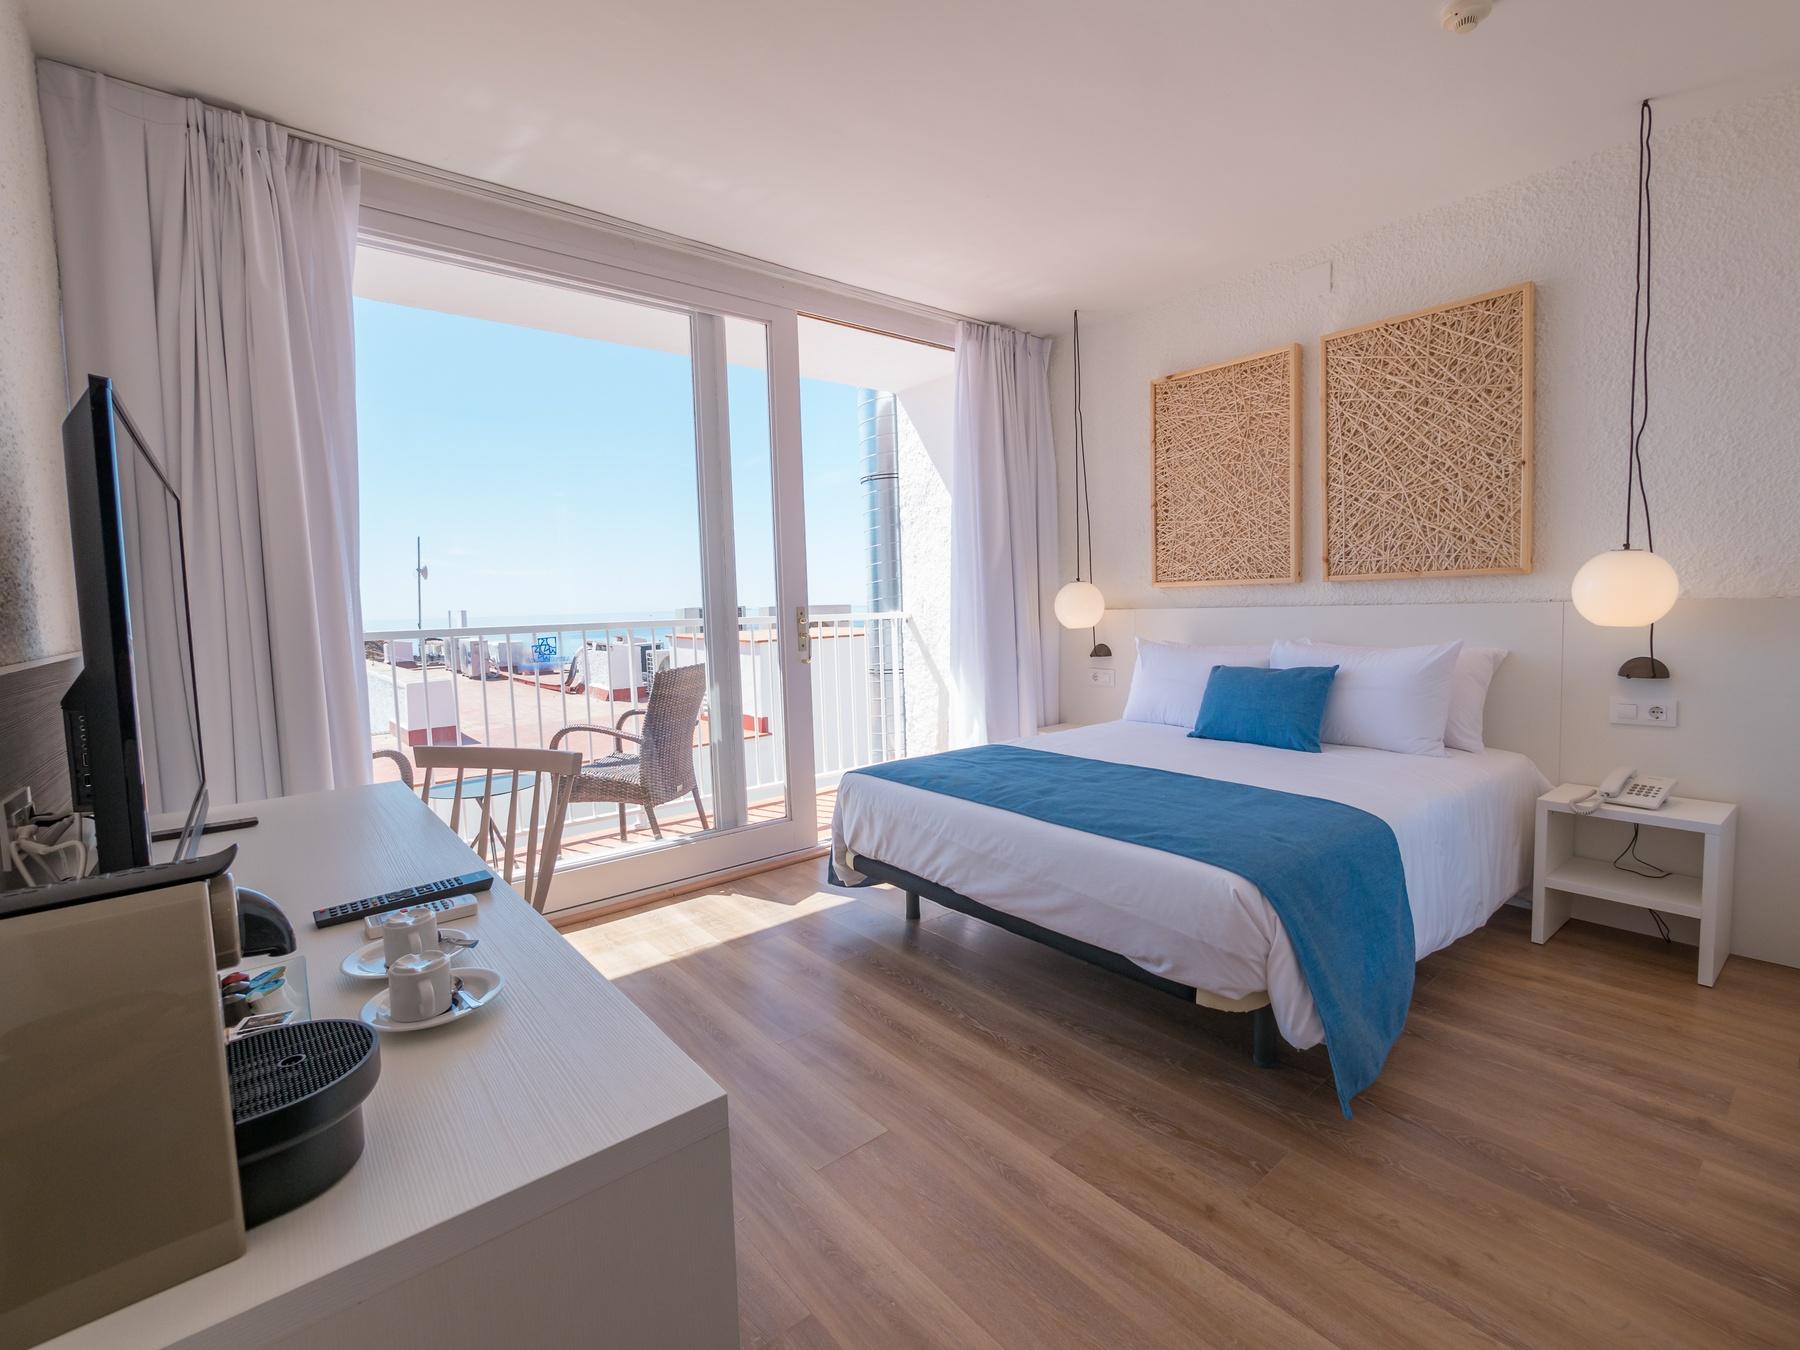 hoteles habitaciones vista mar Costa Brava Tossa